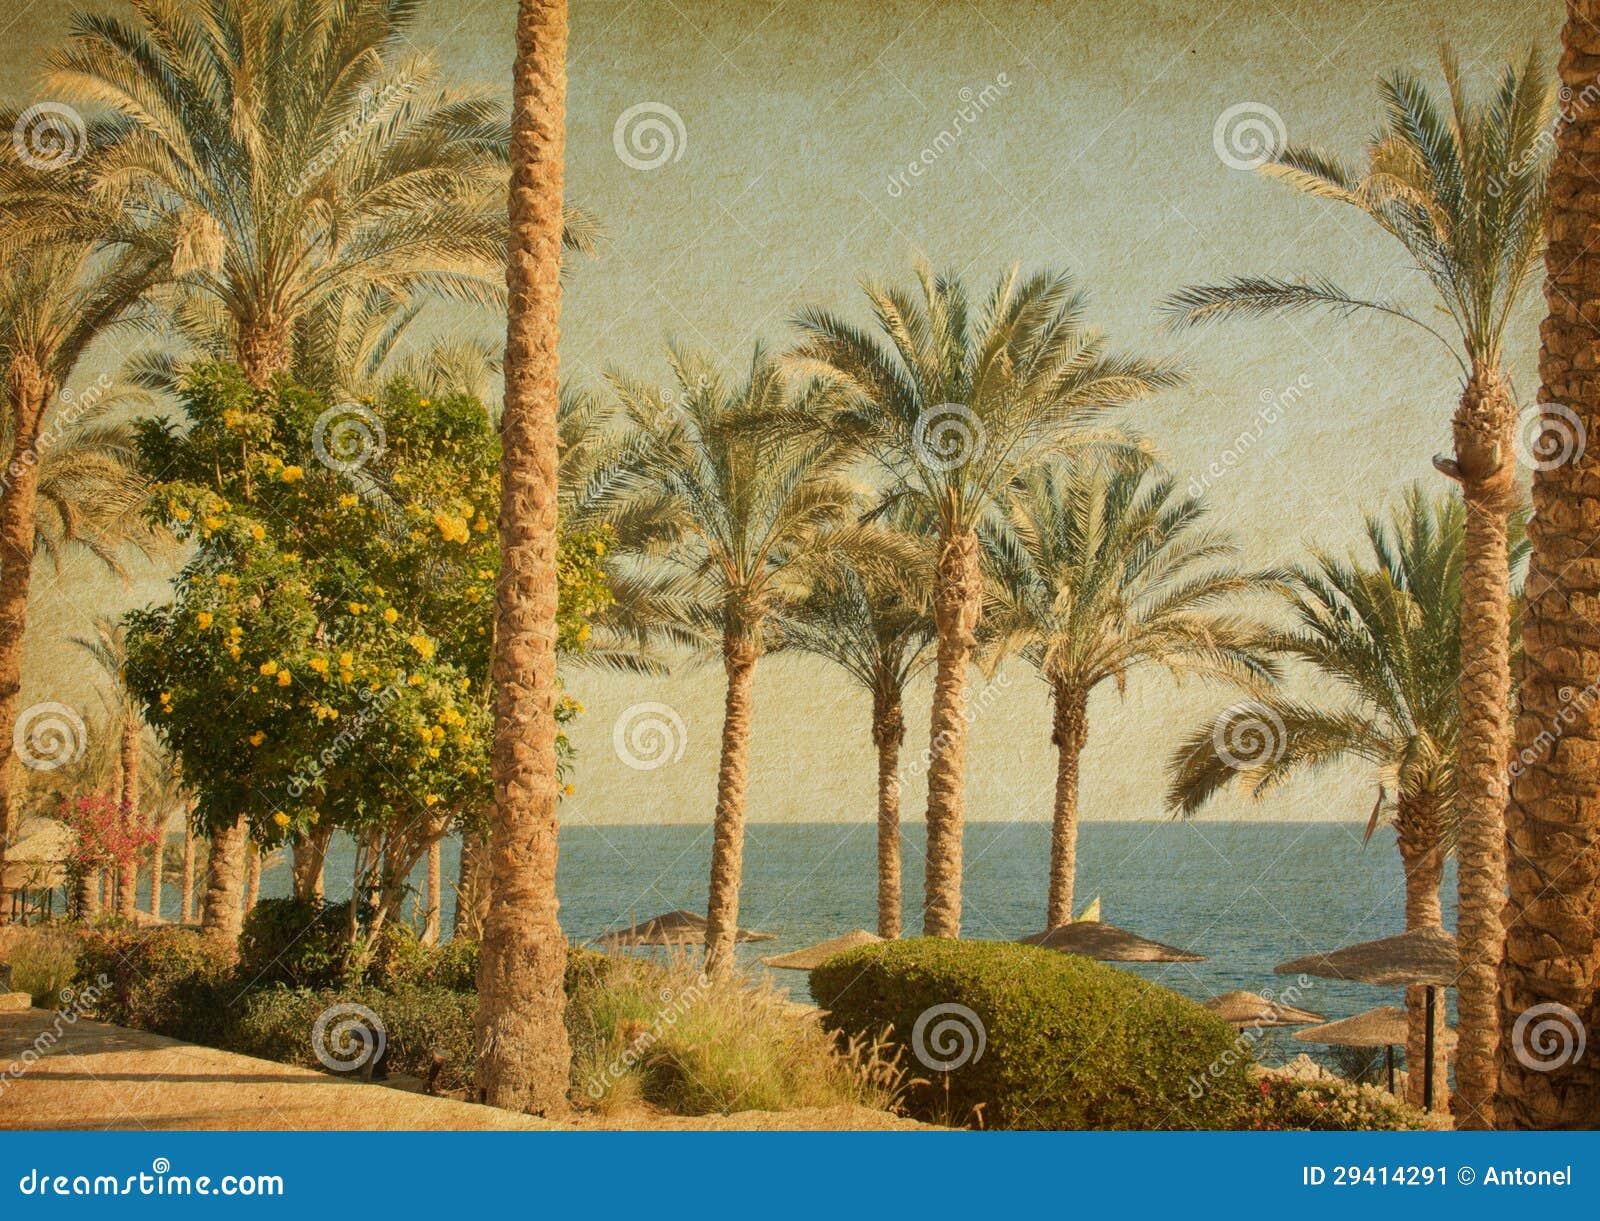 Retro Bild des Strandes